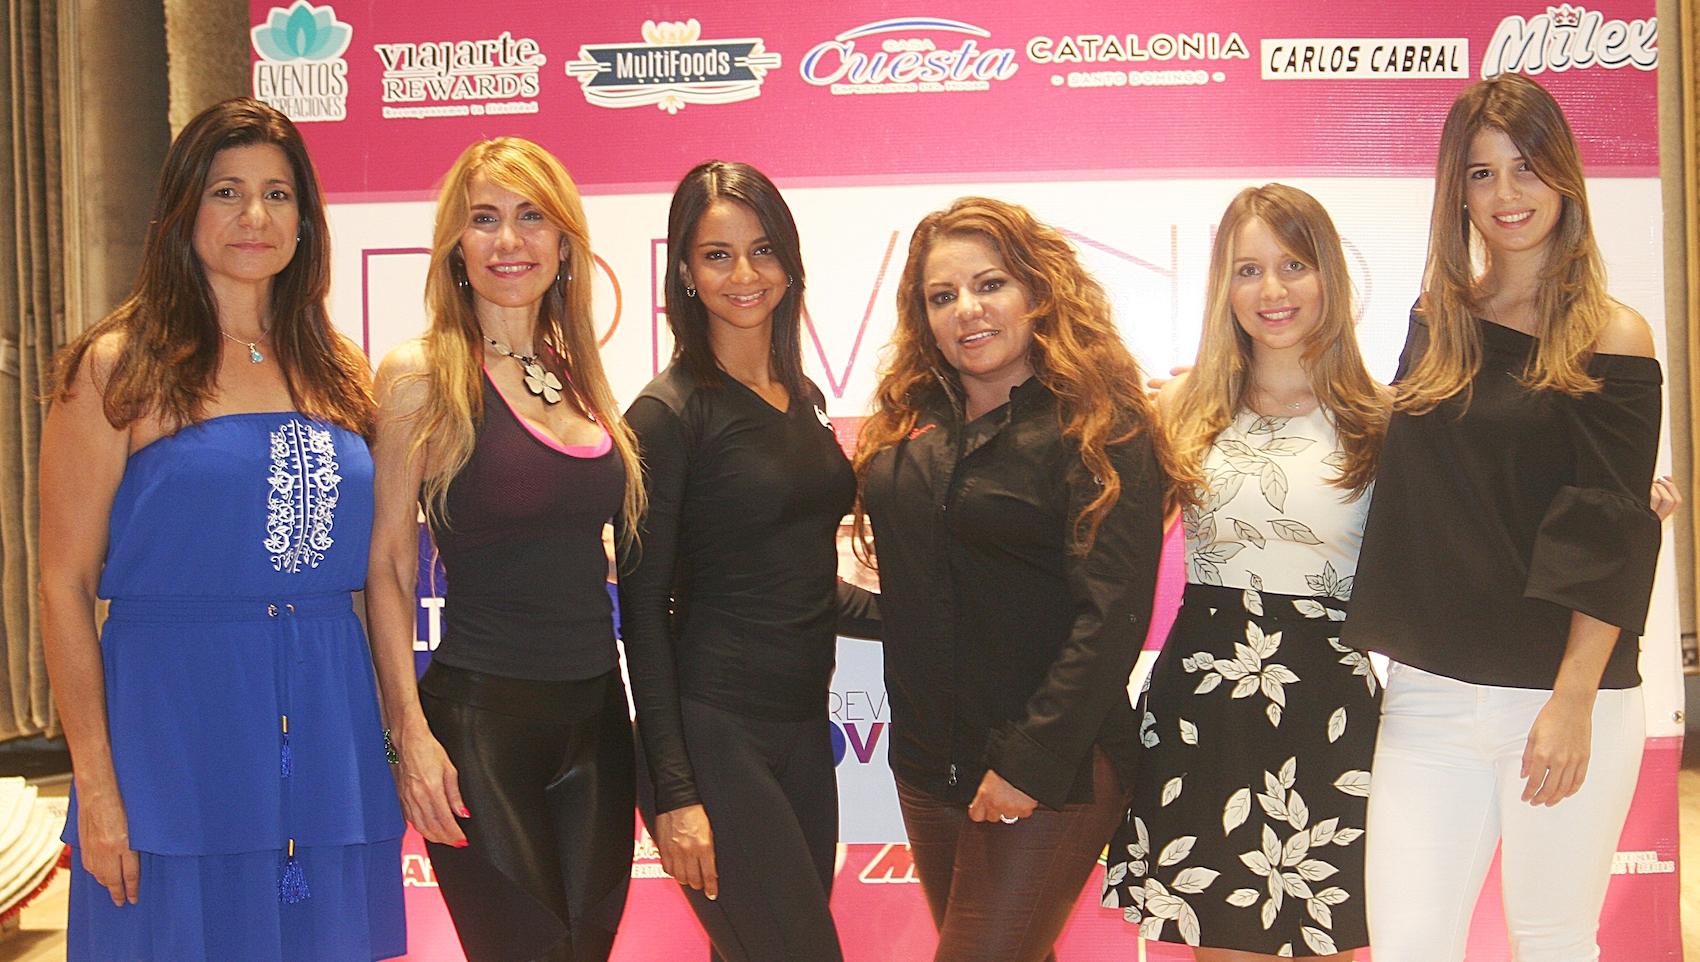 Luisa Feliz, Aileen Khoury, Leisy García, Chef Lala, Carla Báez y Alexandra Chotin.